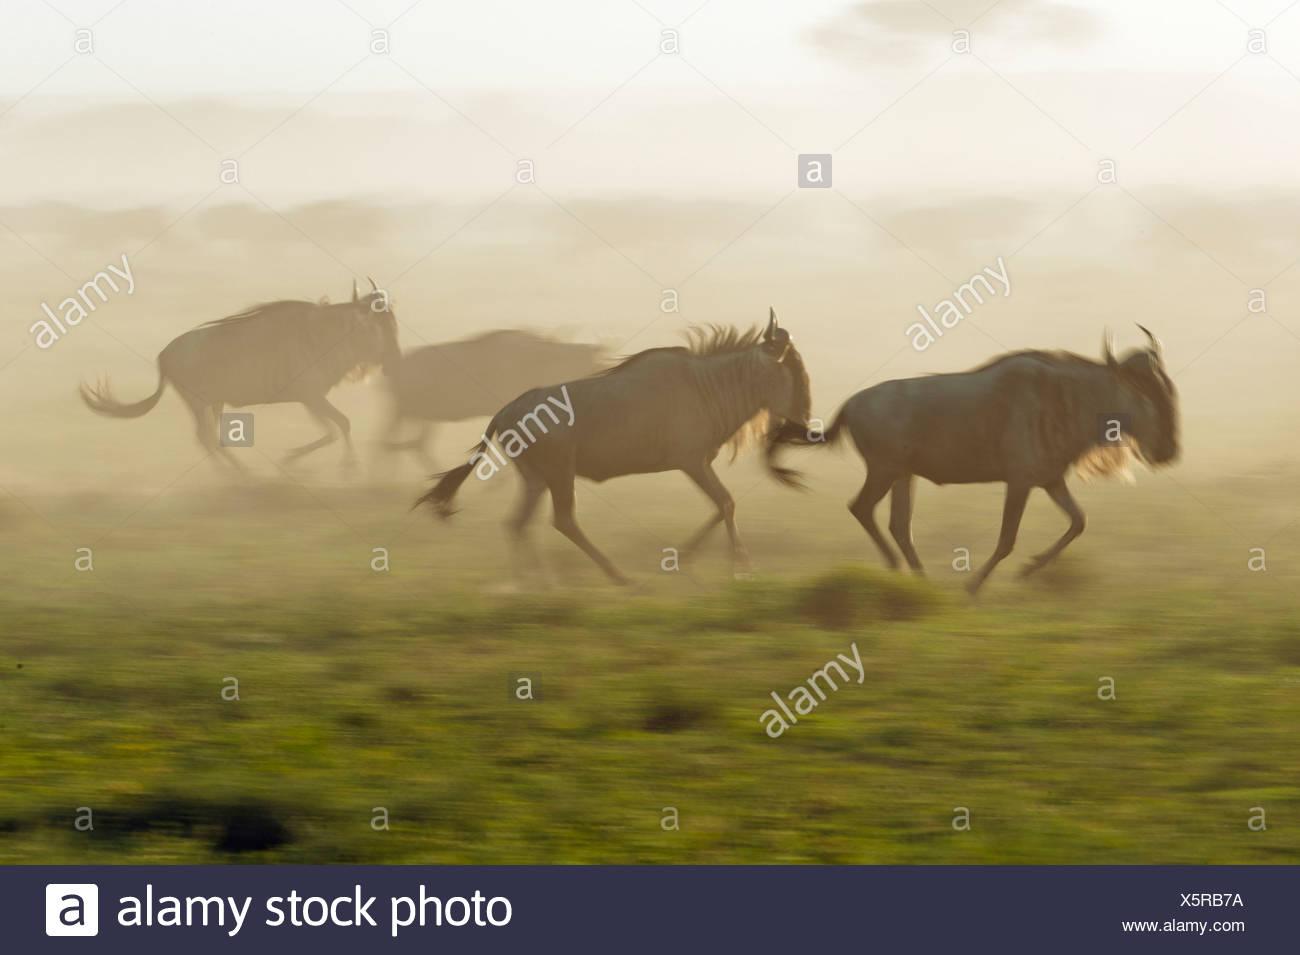 Whirling dust from Blue Wildebeest (Connochaetes taurinus) running in the evening haze, Serengeti, Tanzania - Stock Image